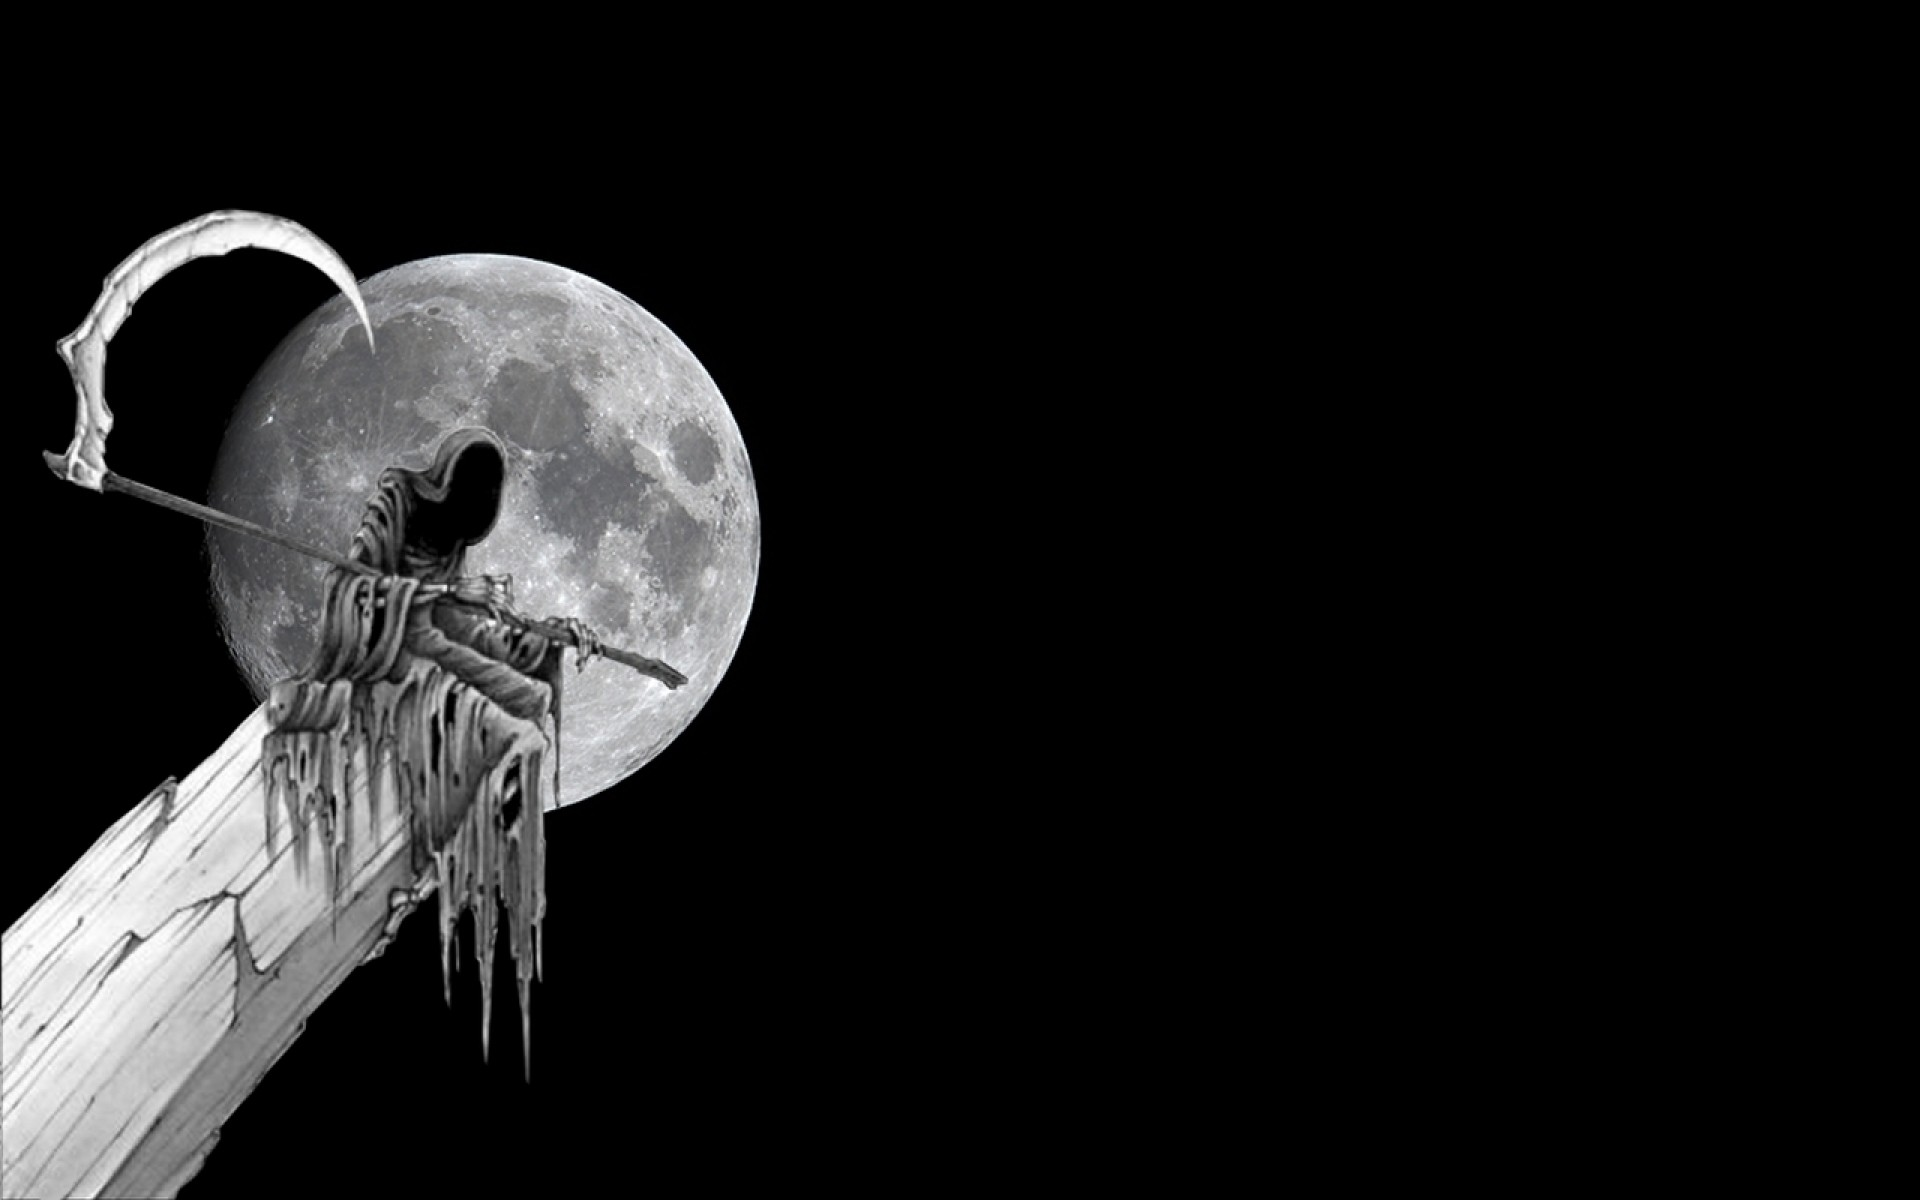 Dark Grim Reaper Horror Skeletons Skull Creepy E Wallpaper At Dark  Wallpapers